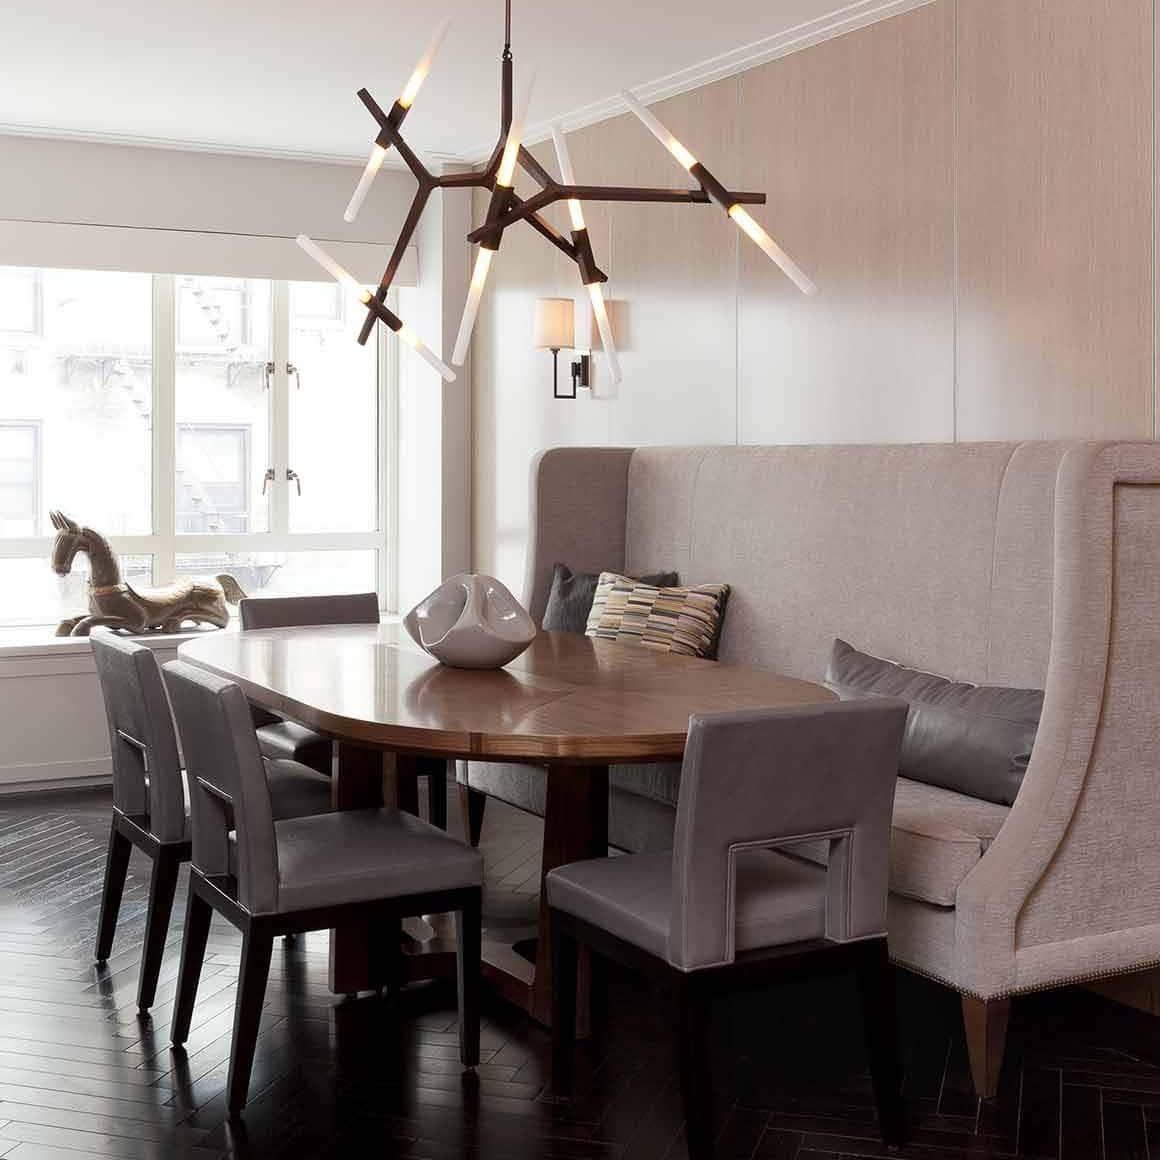 Statement lighting make an impact – Blog by Darci Hether New York